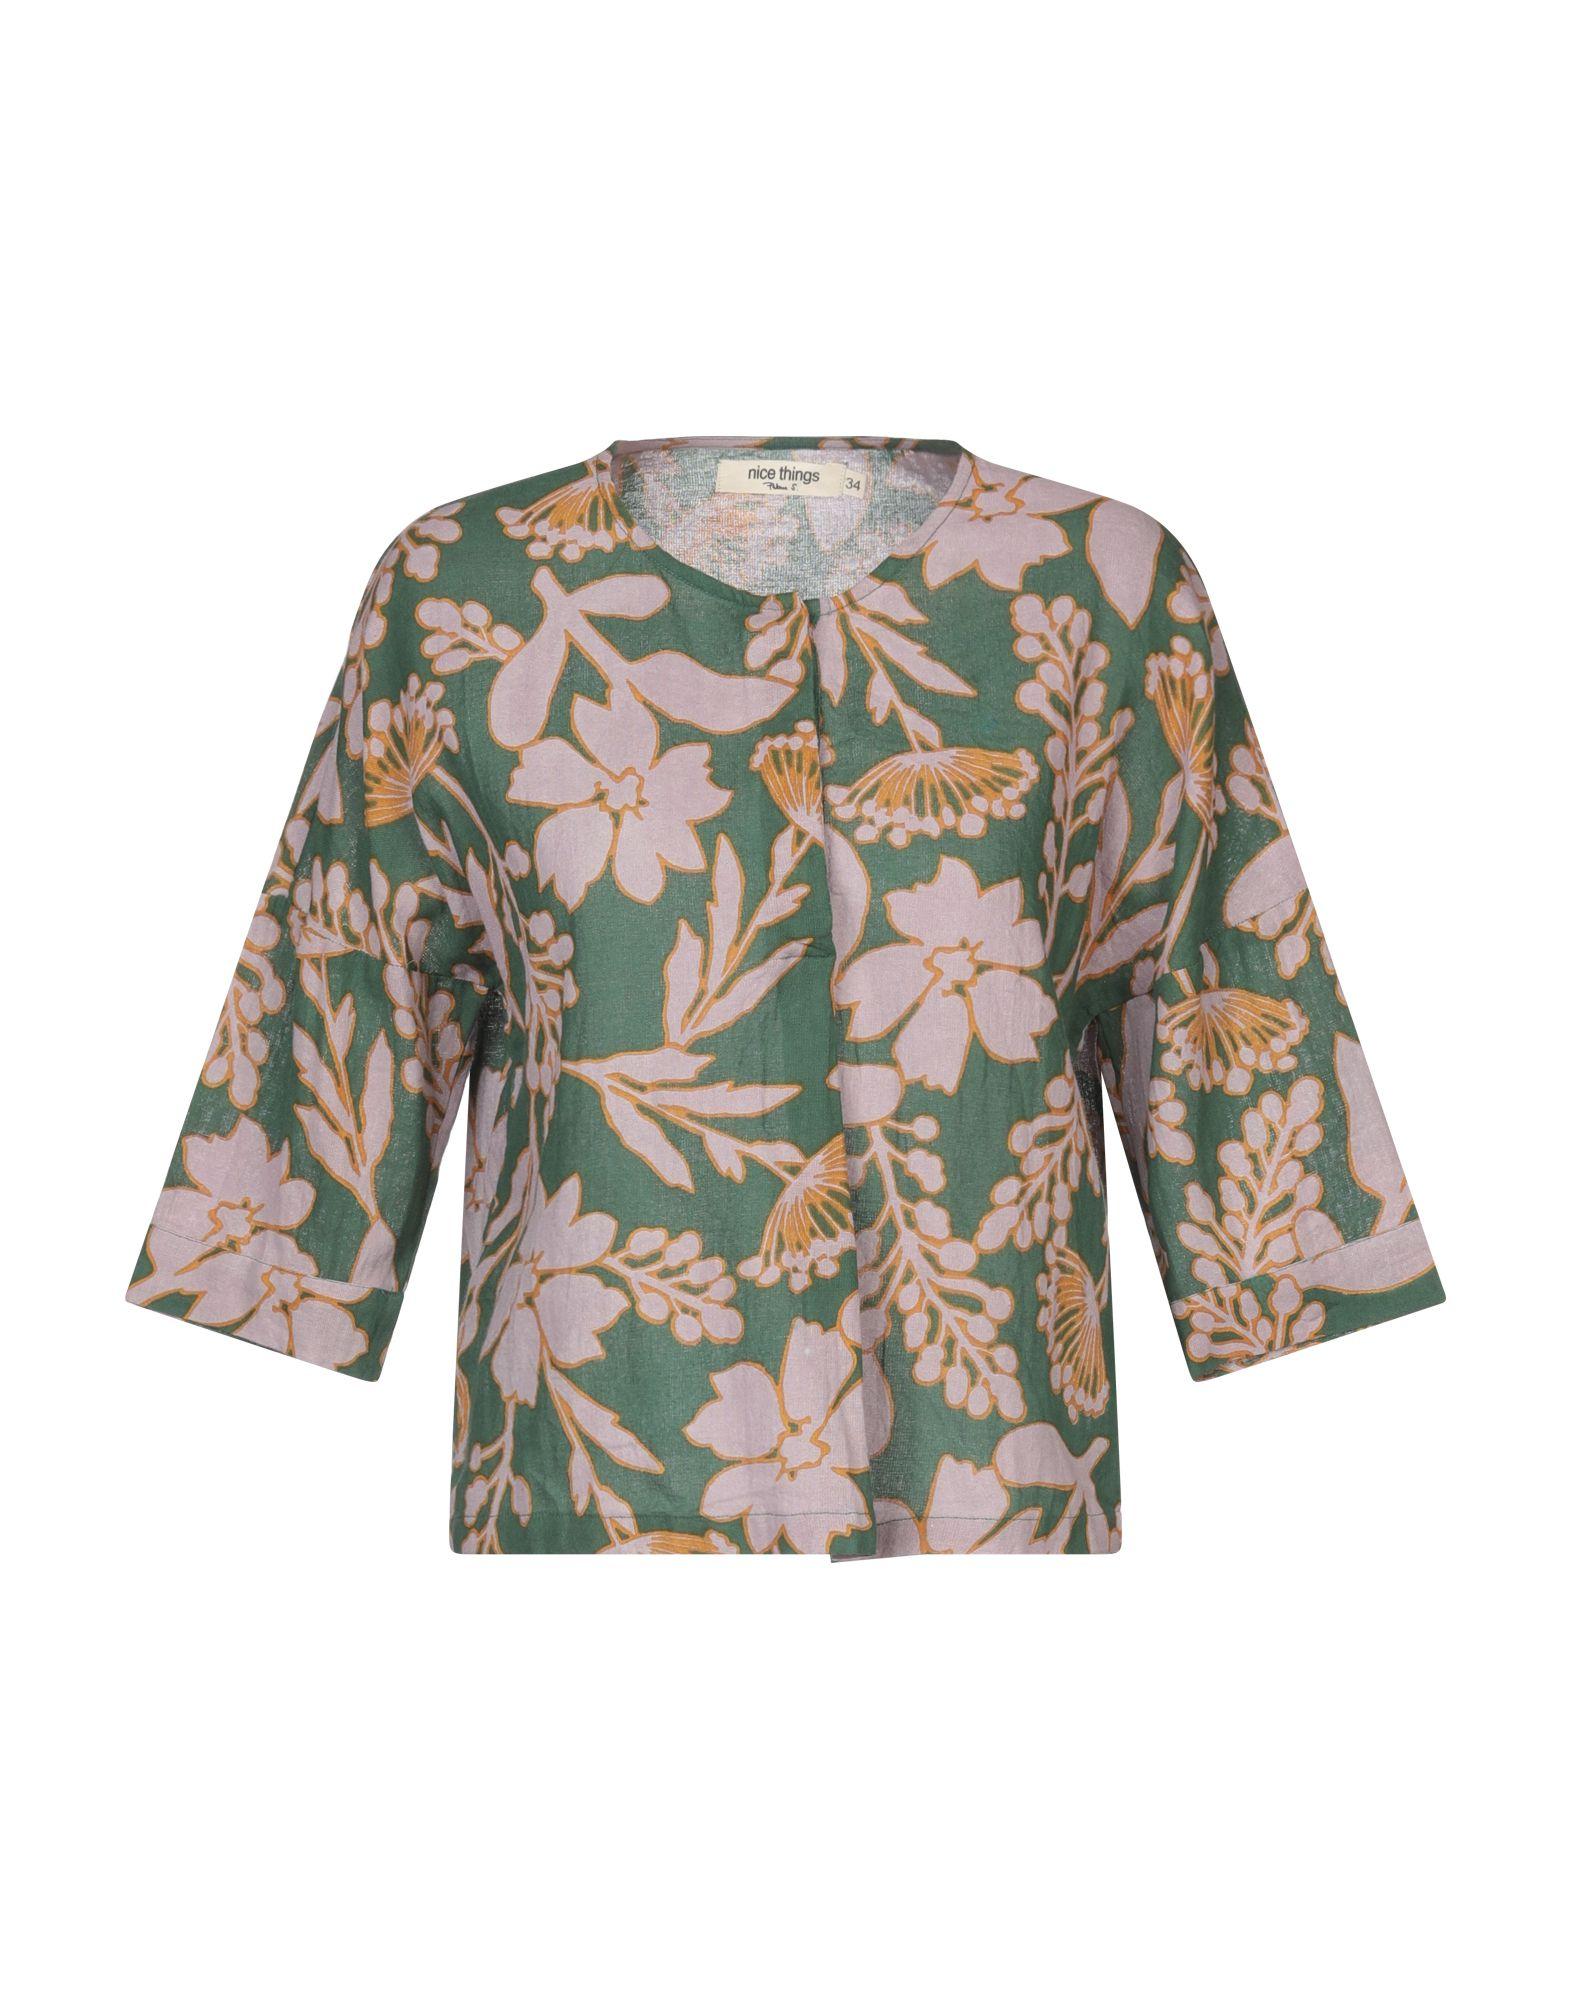 Фото - NICE THINGS by PALOMA S. Блузка henry cotton s блузка